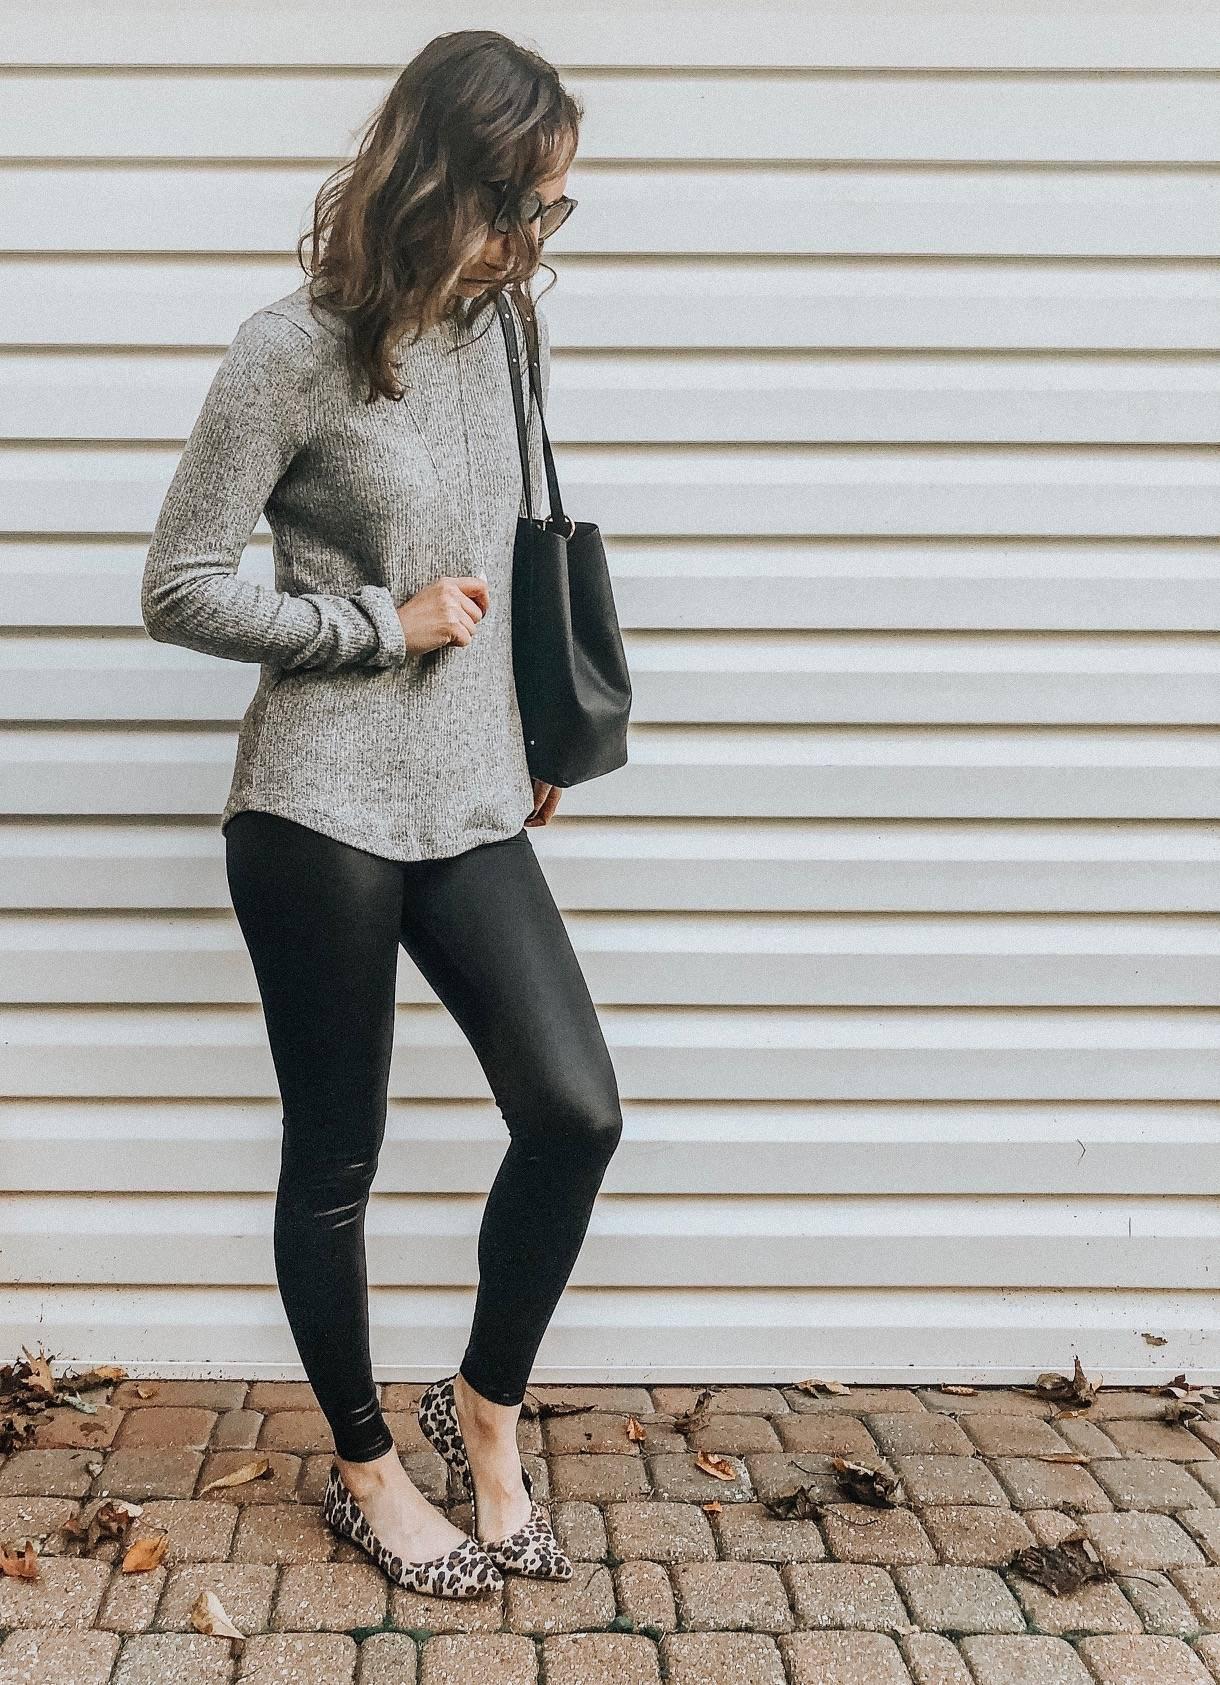 Daily Splendor | Life and Style Blog. Faux leather leggings styled 3 ways #fallfashion #momfashion #worklook #fashionblog #daytimelook